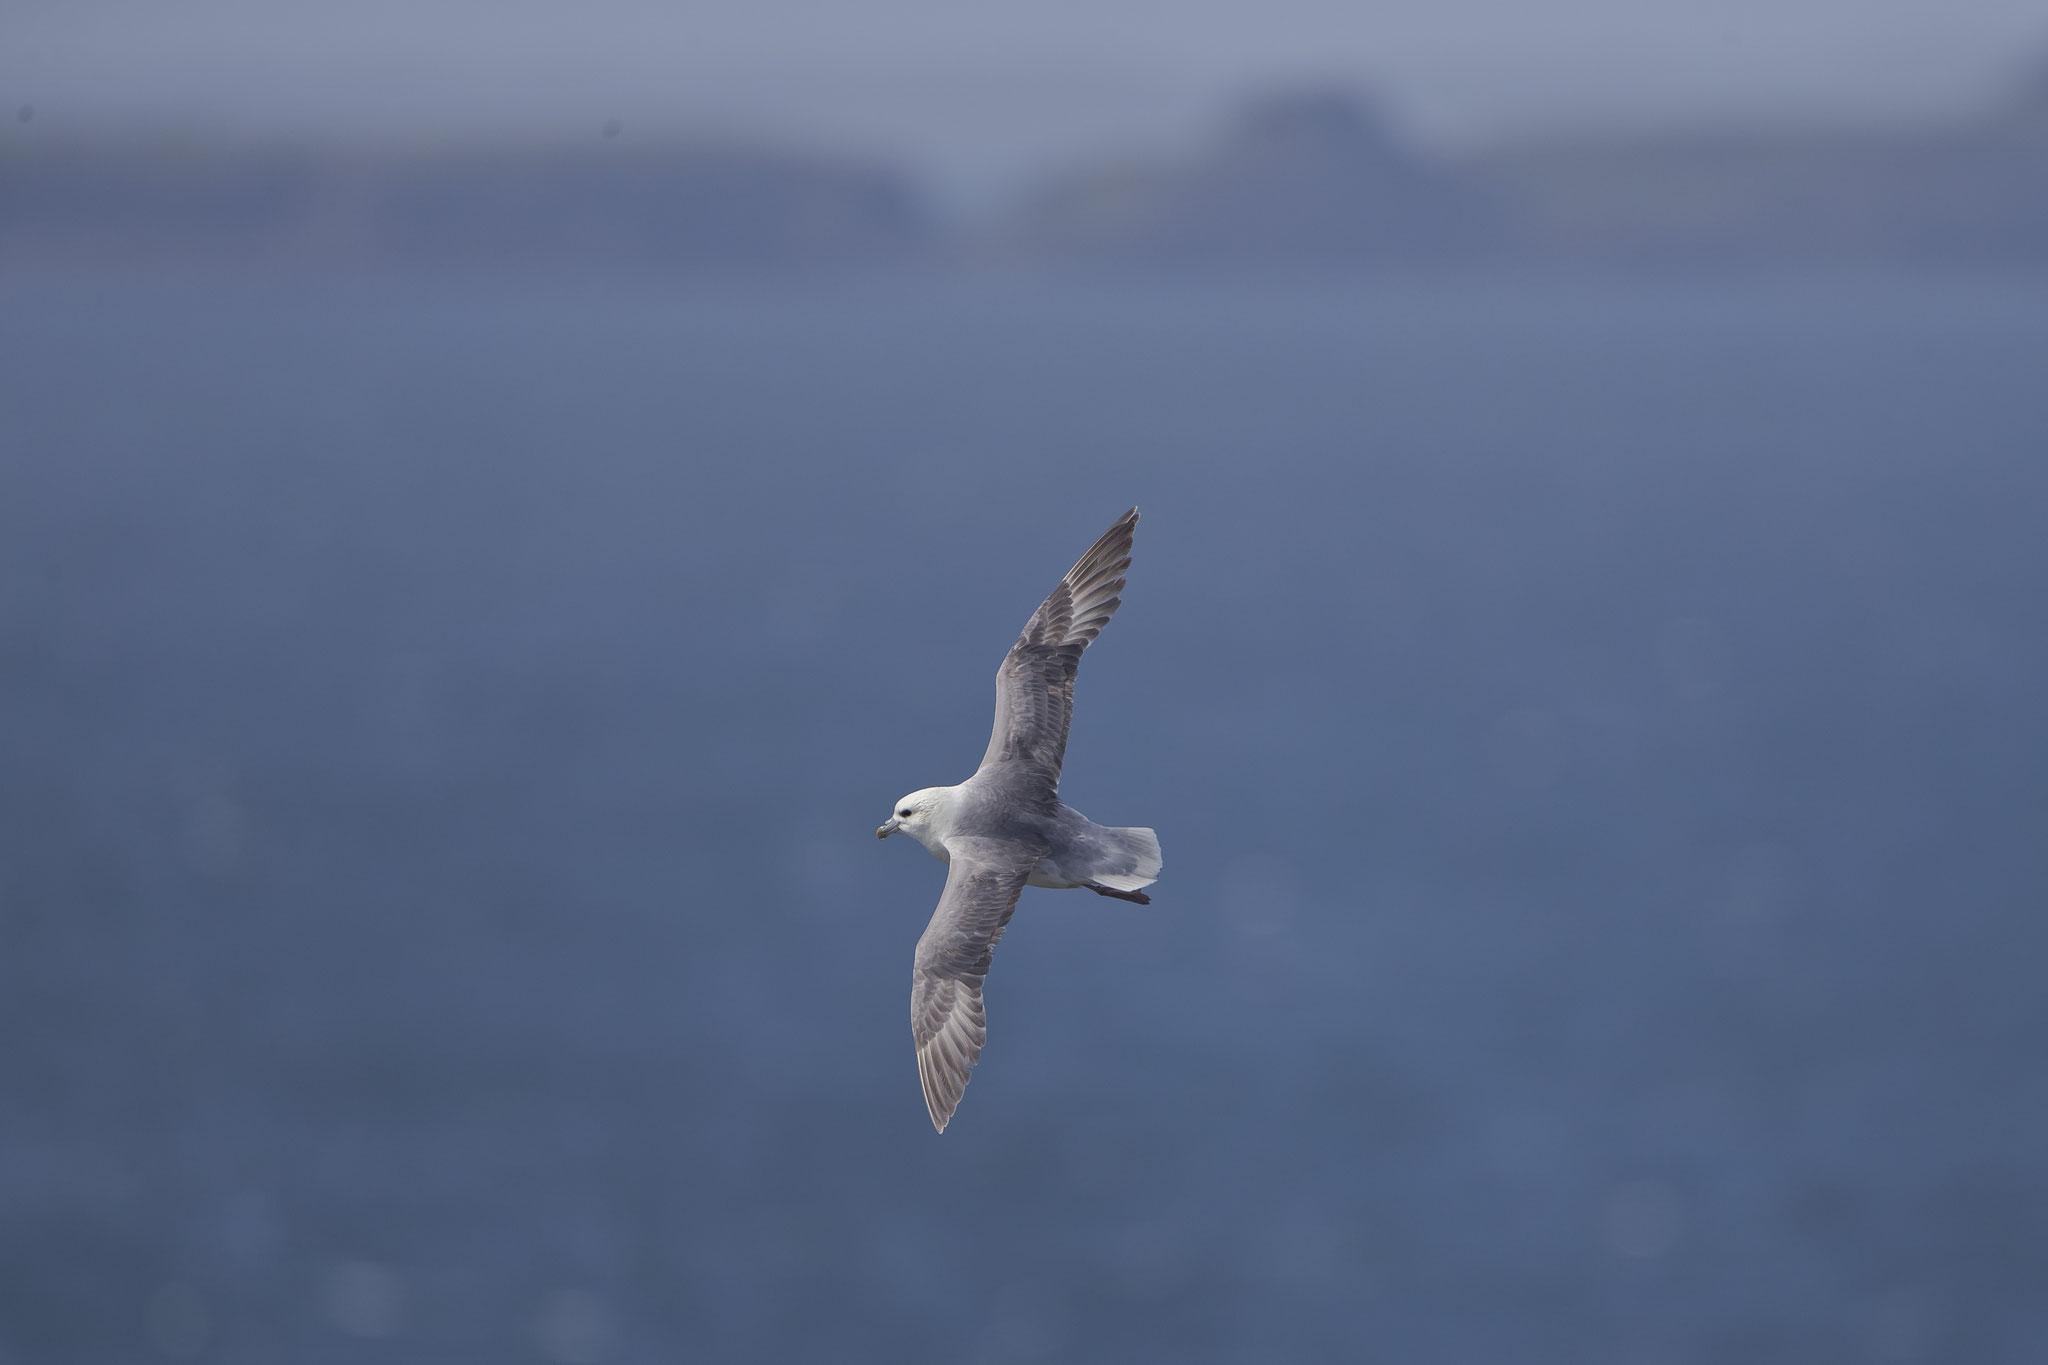 Eissturmvögel sind begnadete Gleitflieger...